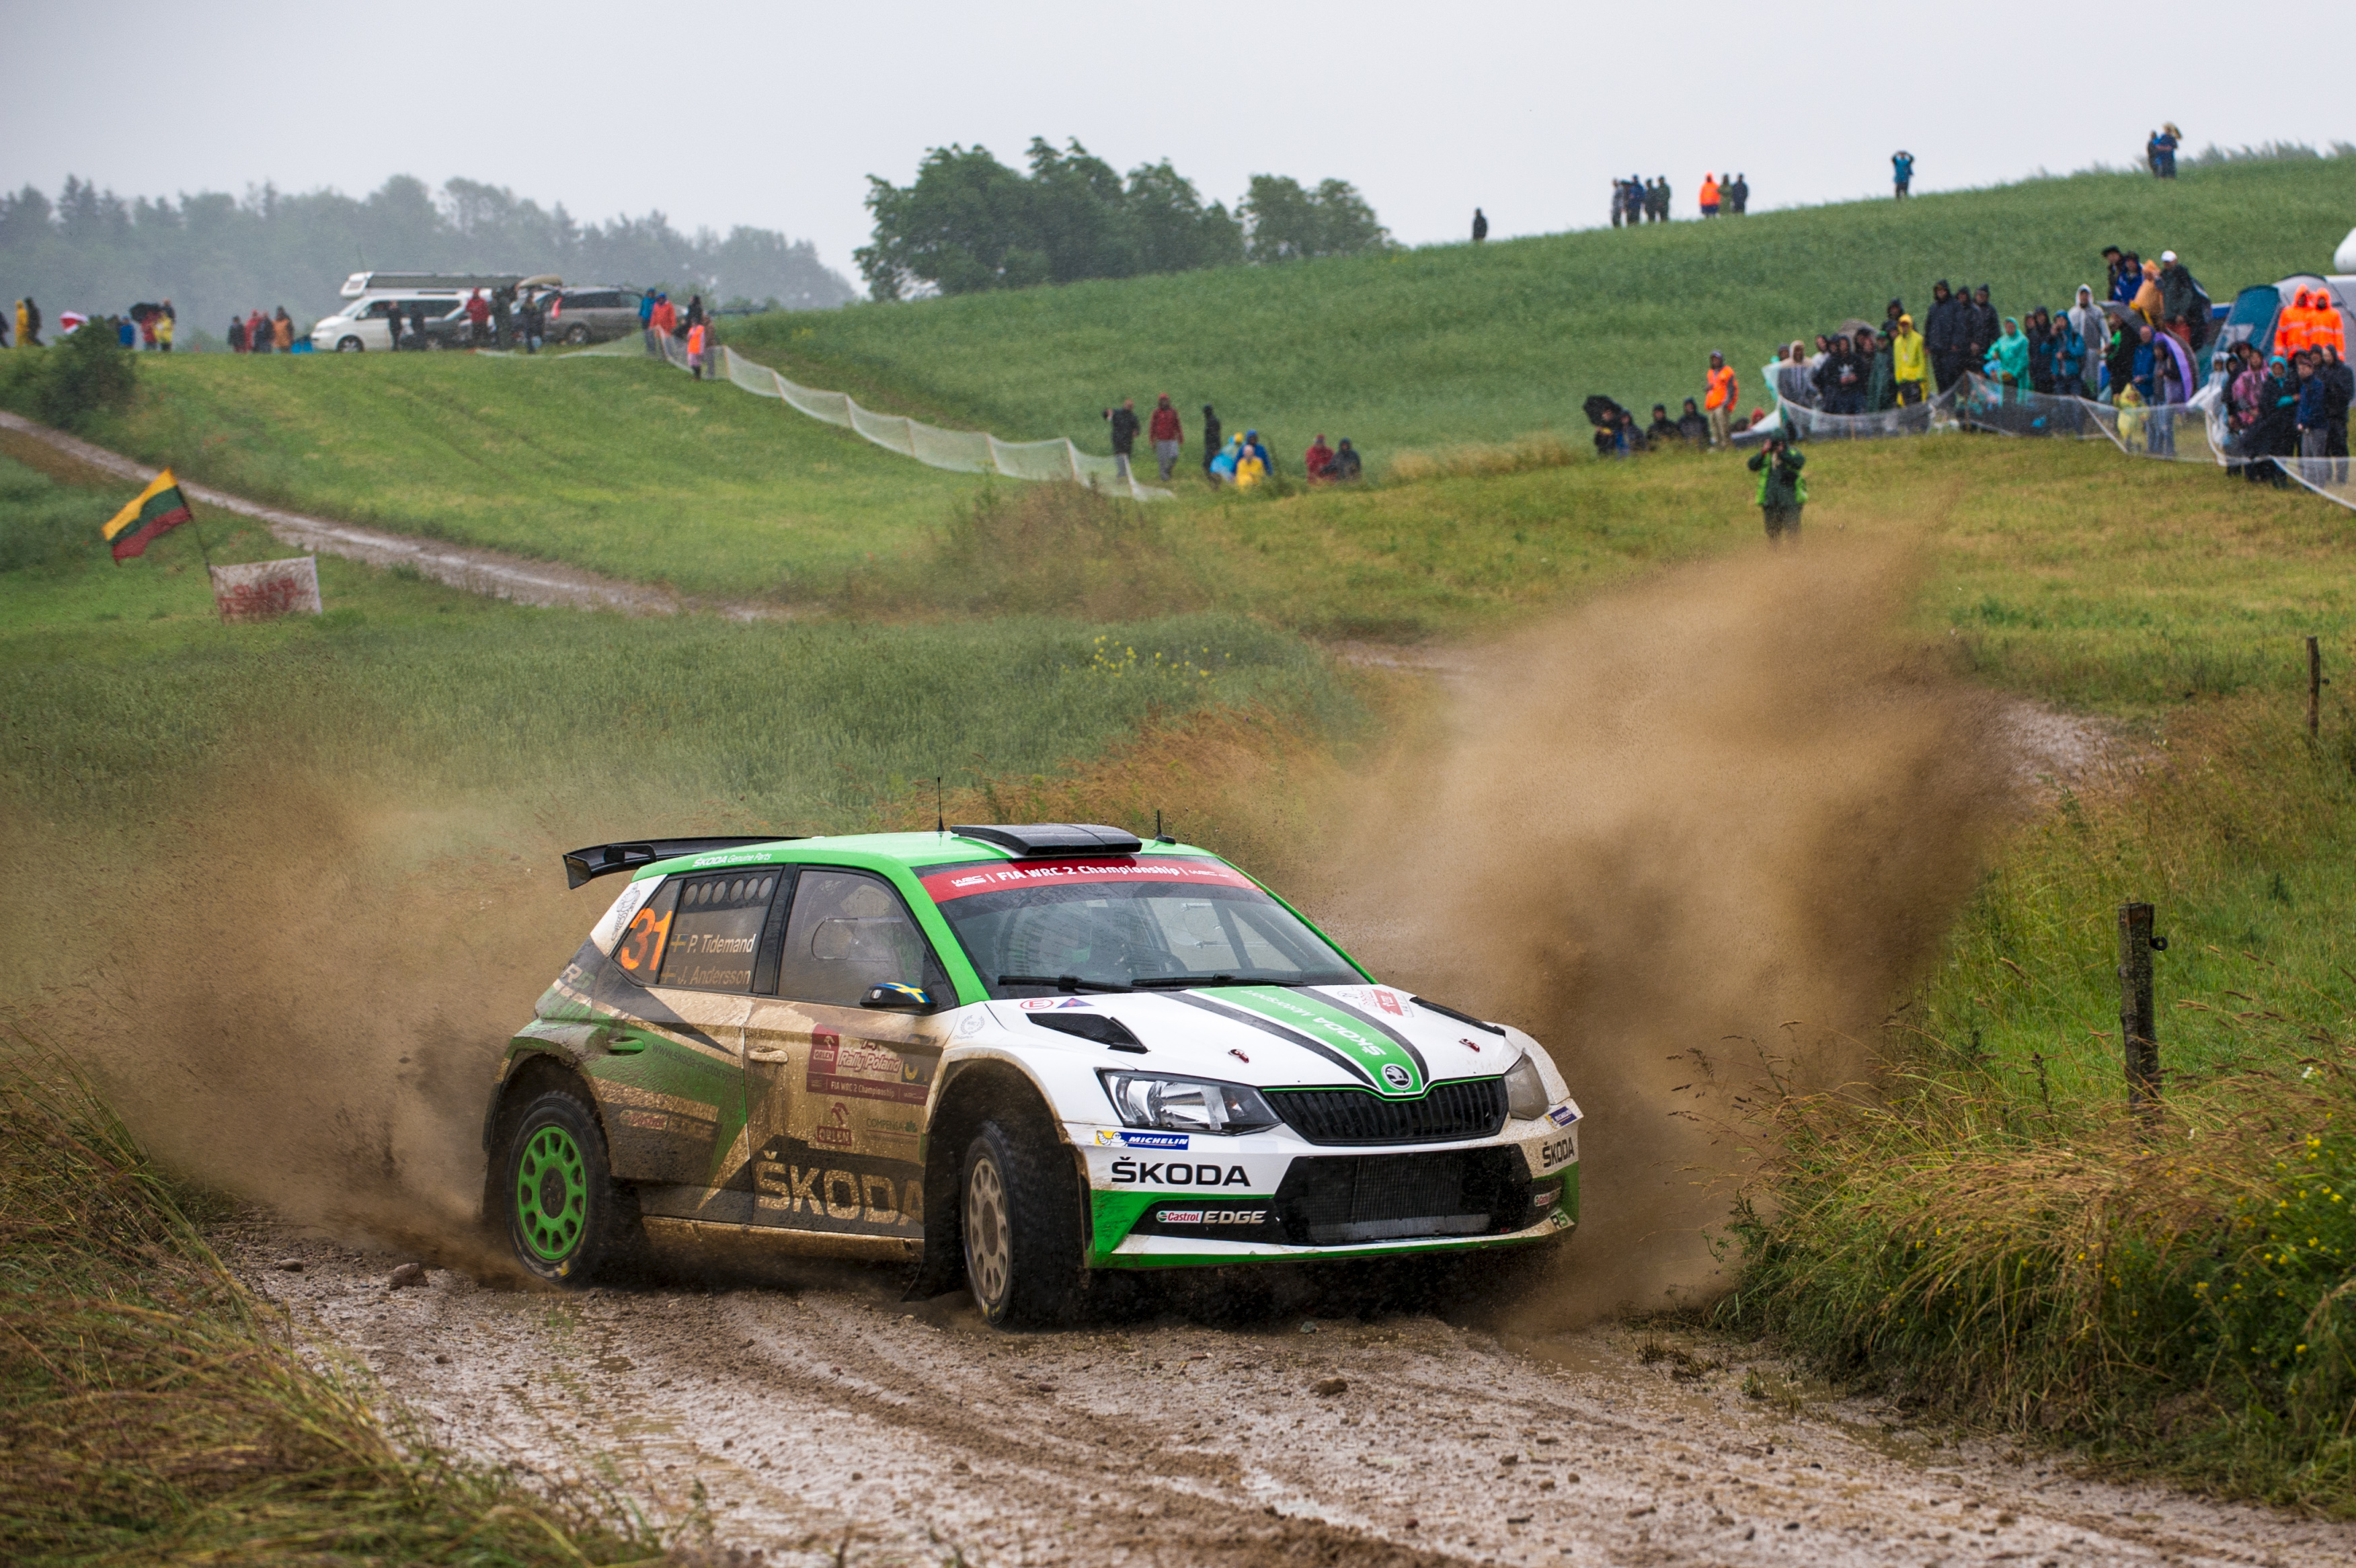 Výsledek obrázku pro Rally Polsko 2017